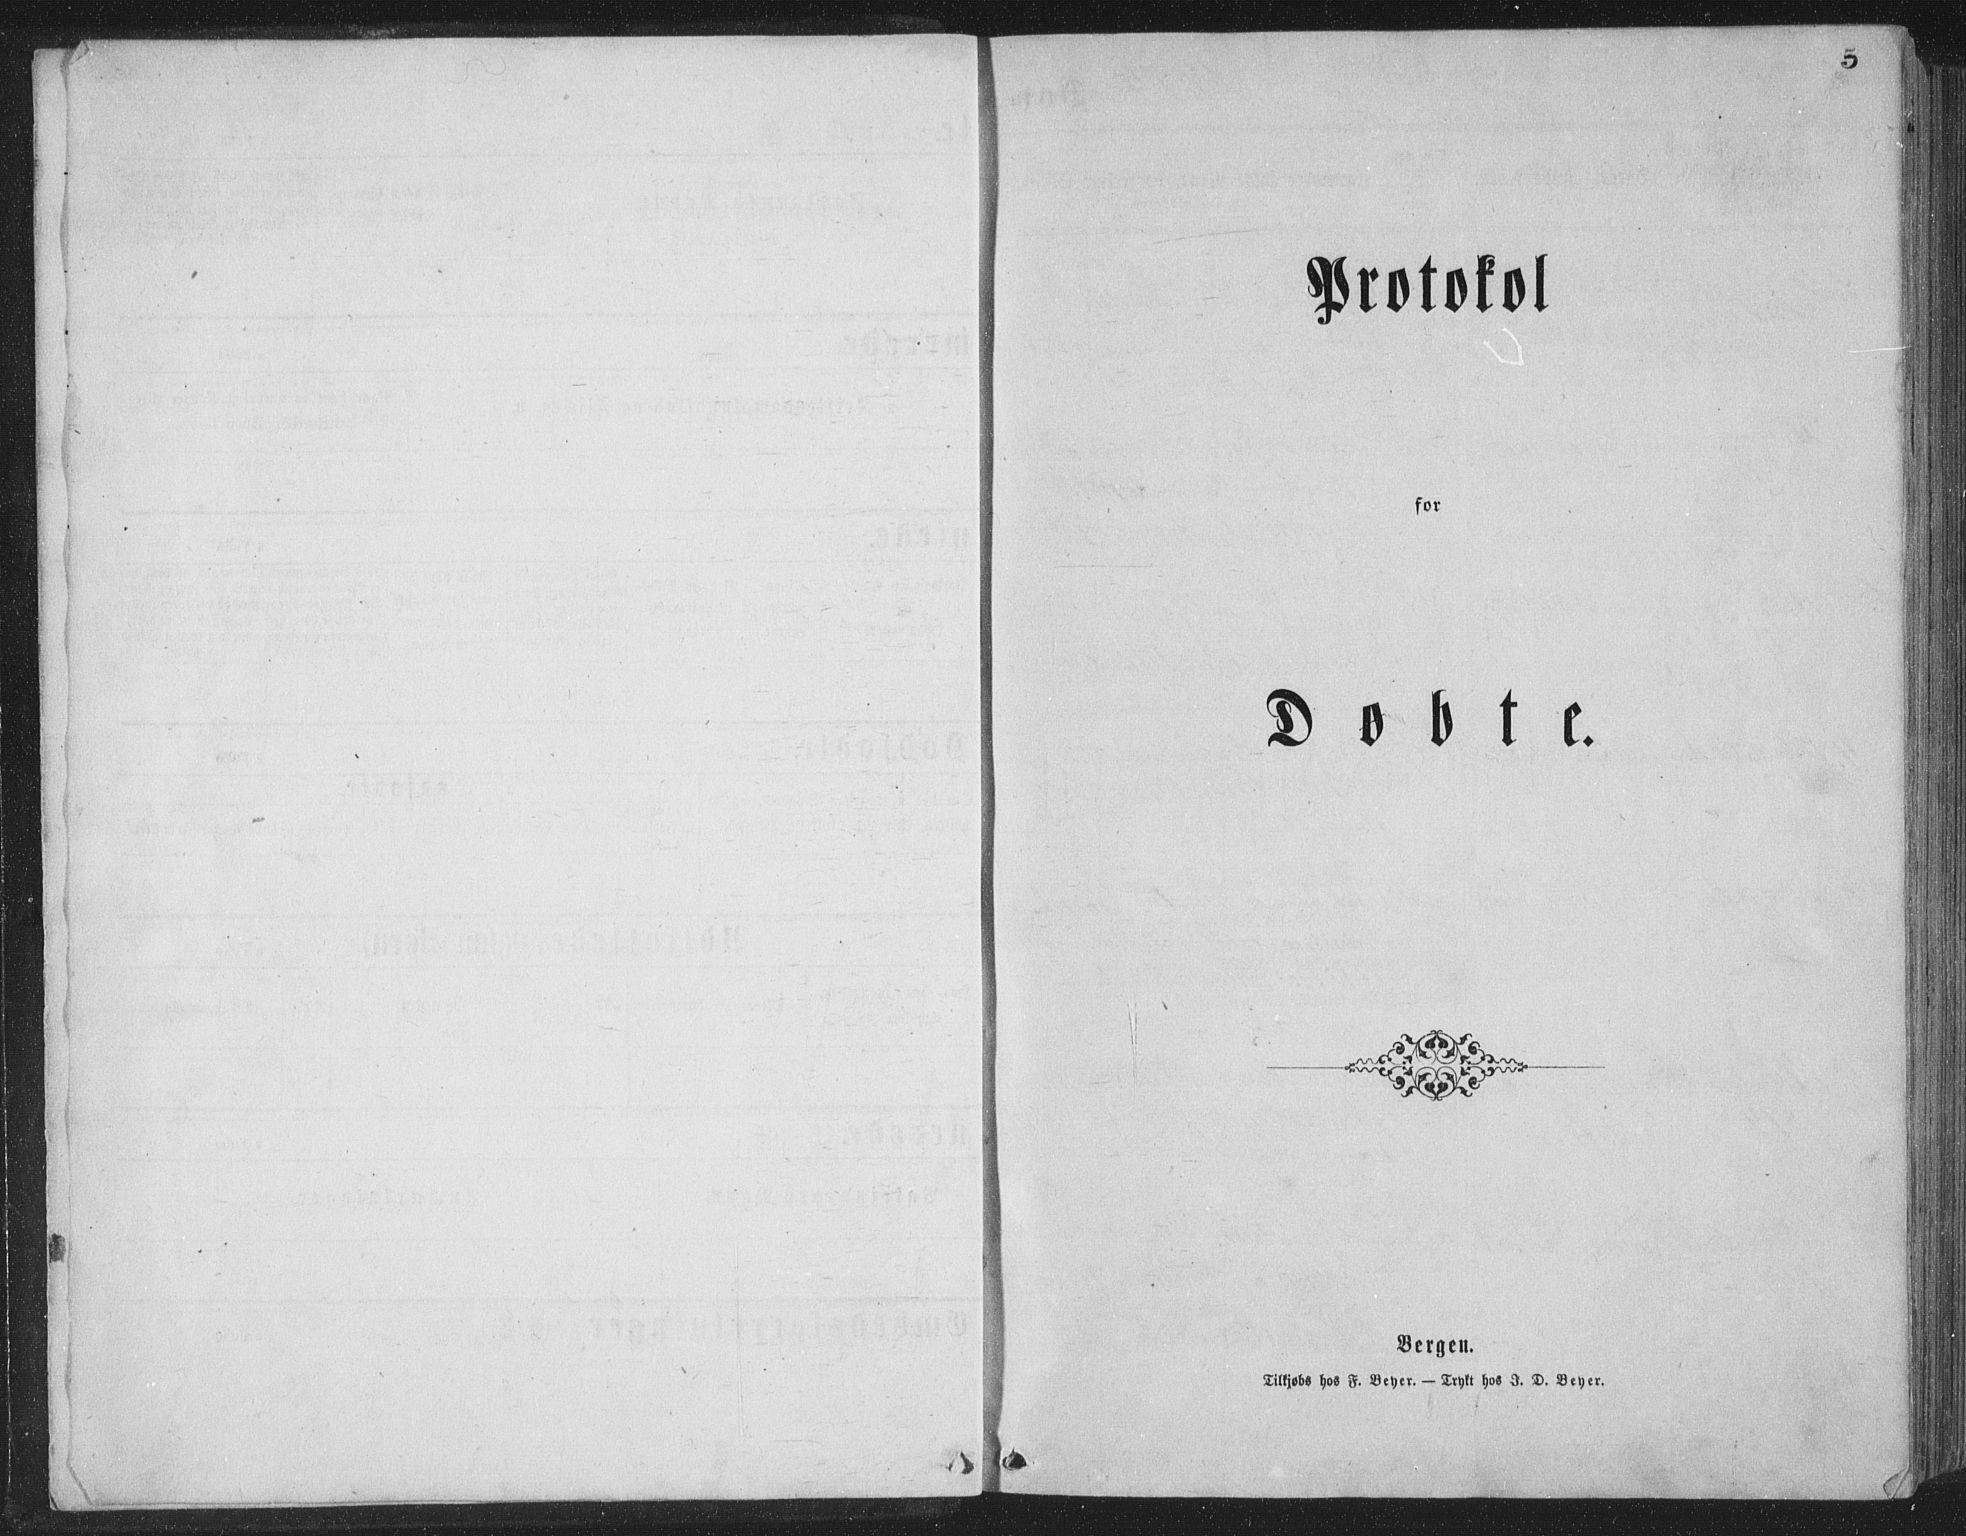 SAT, Ministerialprotokoller, klokkerbøker og fødselsregistre - Nordland, 885/L1213: Klokkerbok nr. 885C02, 1874-1892, s. 5